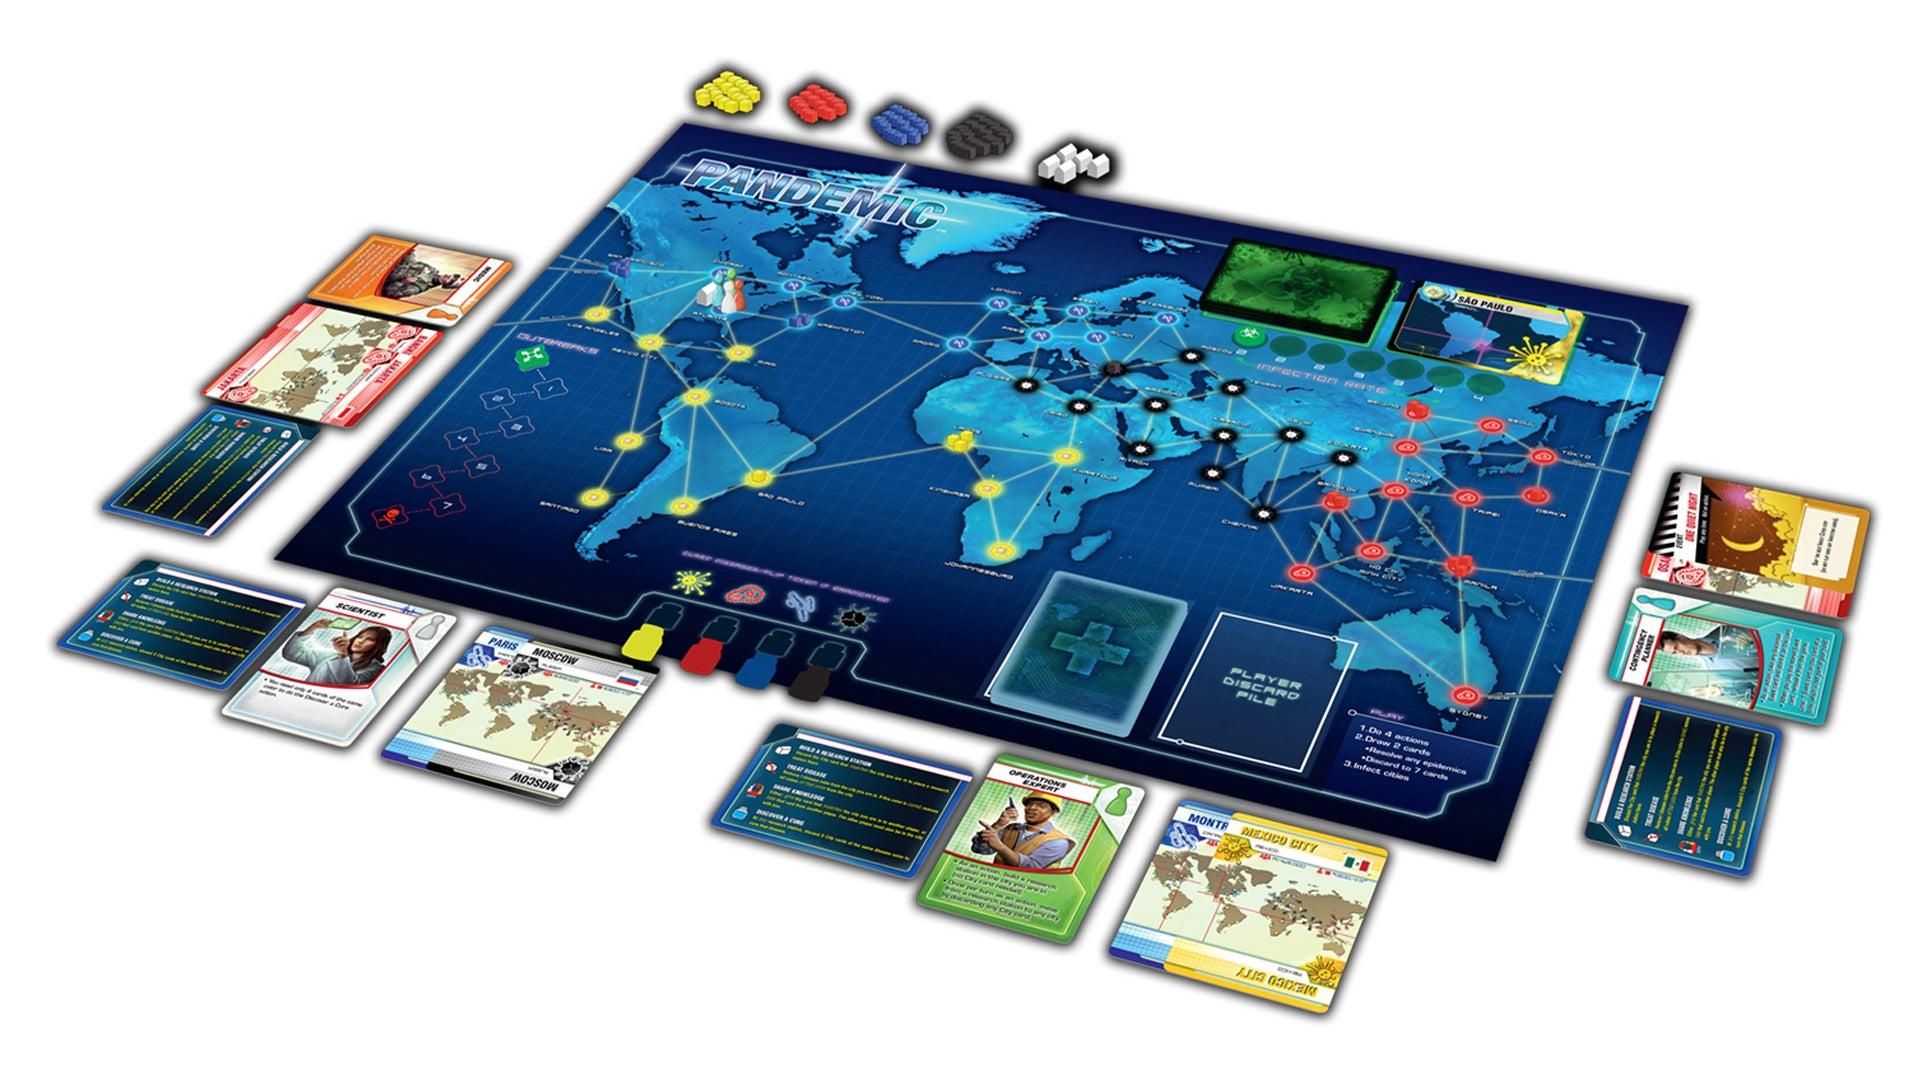 Pandemic beginner board game gameplay layout